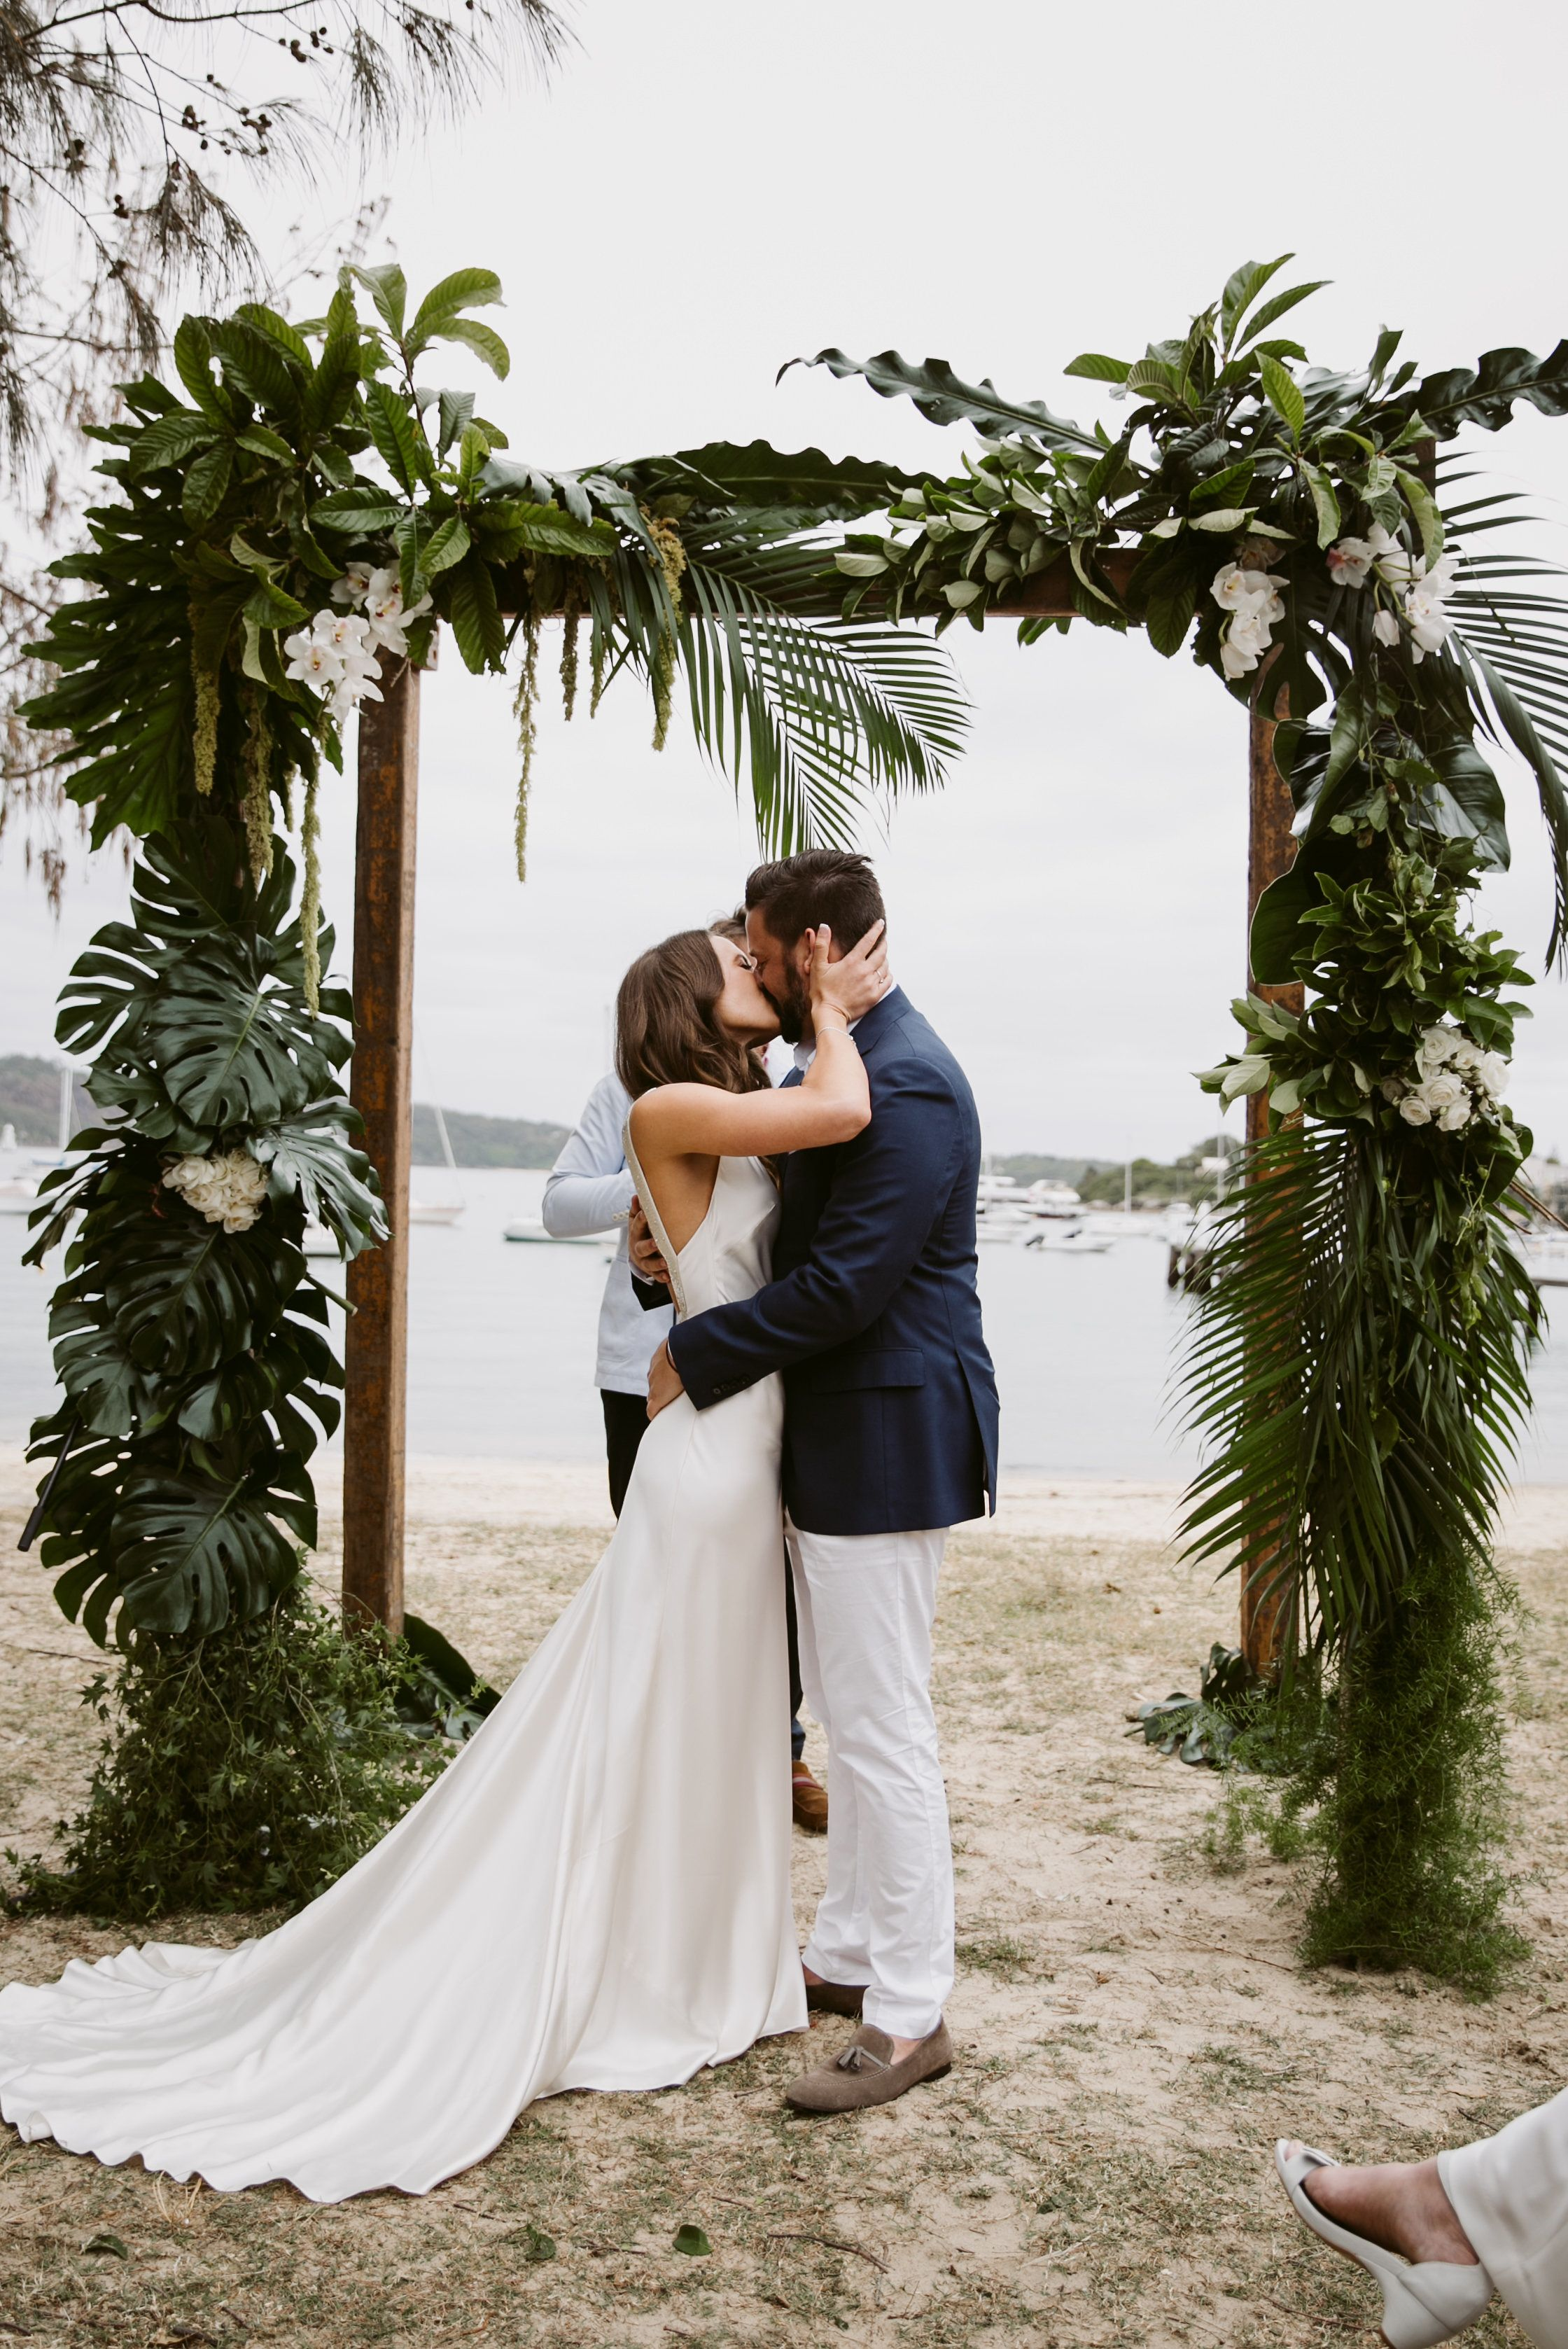 Watsons Bay Photo By Anna Turner Bali Wedding Wedding Beach